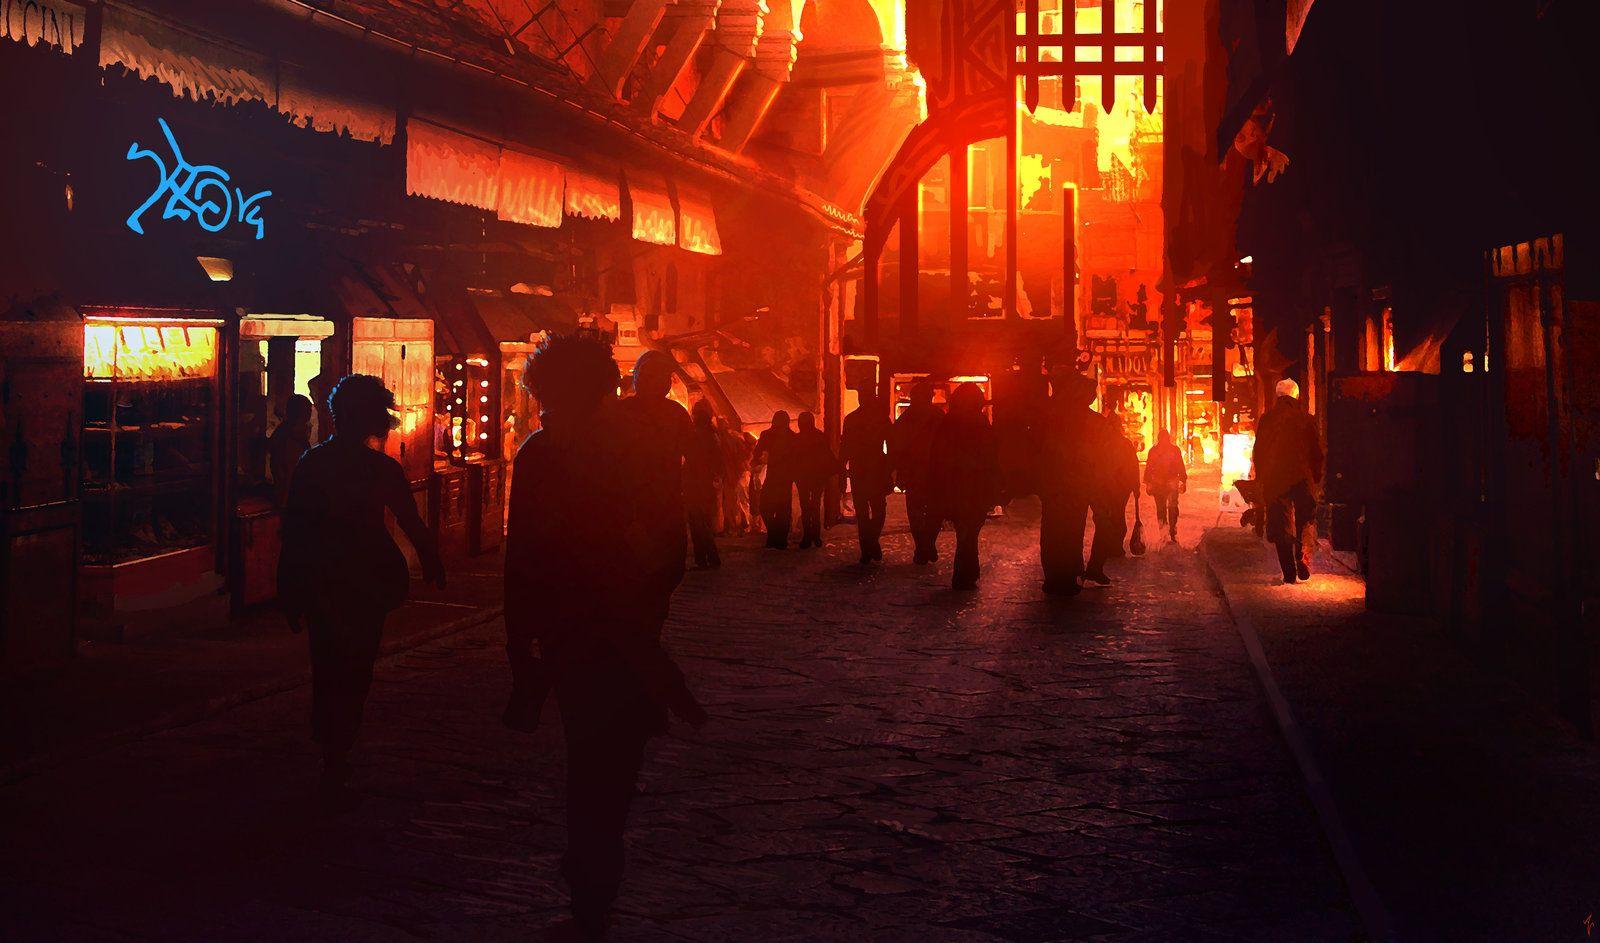 Lower Level Neon Lava Orange Aesthetic Cyberpunk Aesthetic City Aesthetic Dark City